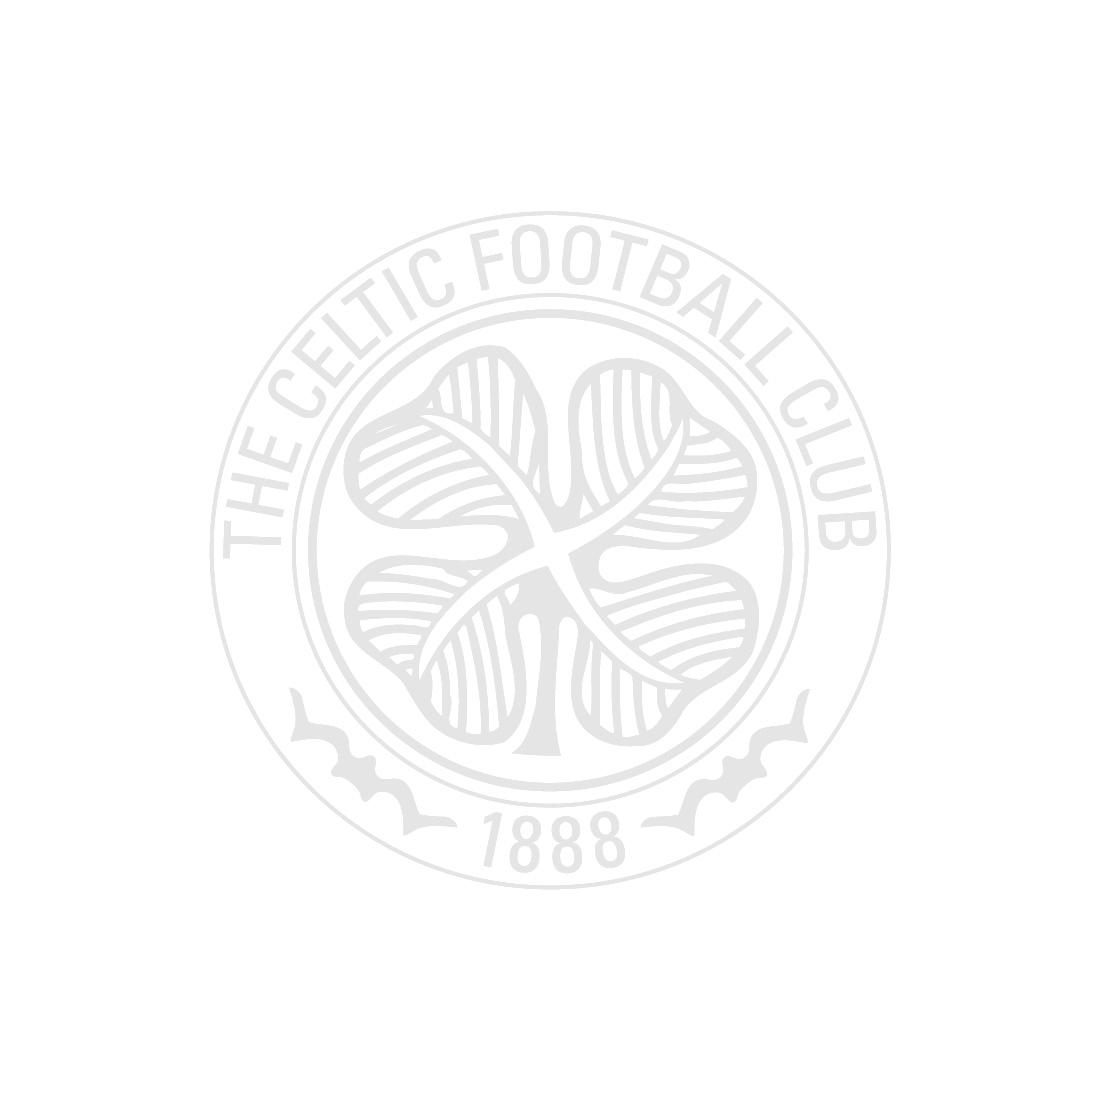 Celtic Training Storm Rain Jacket with No sponsor